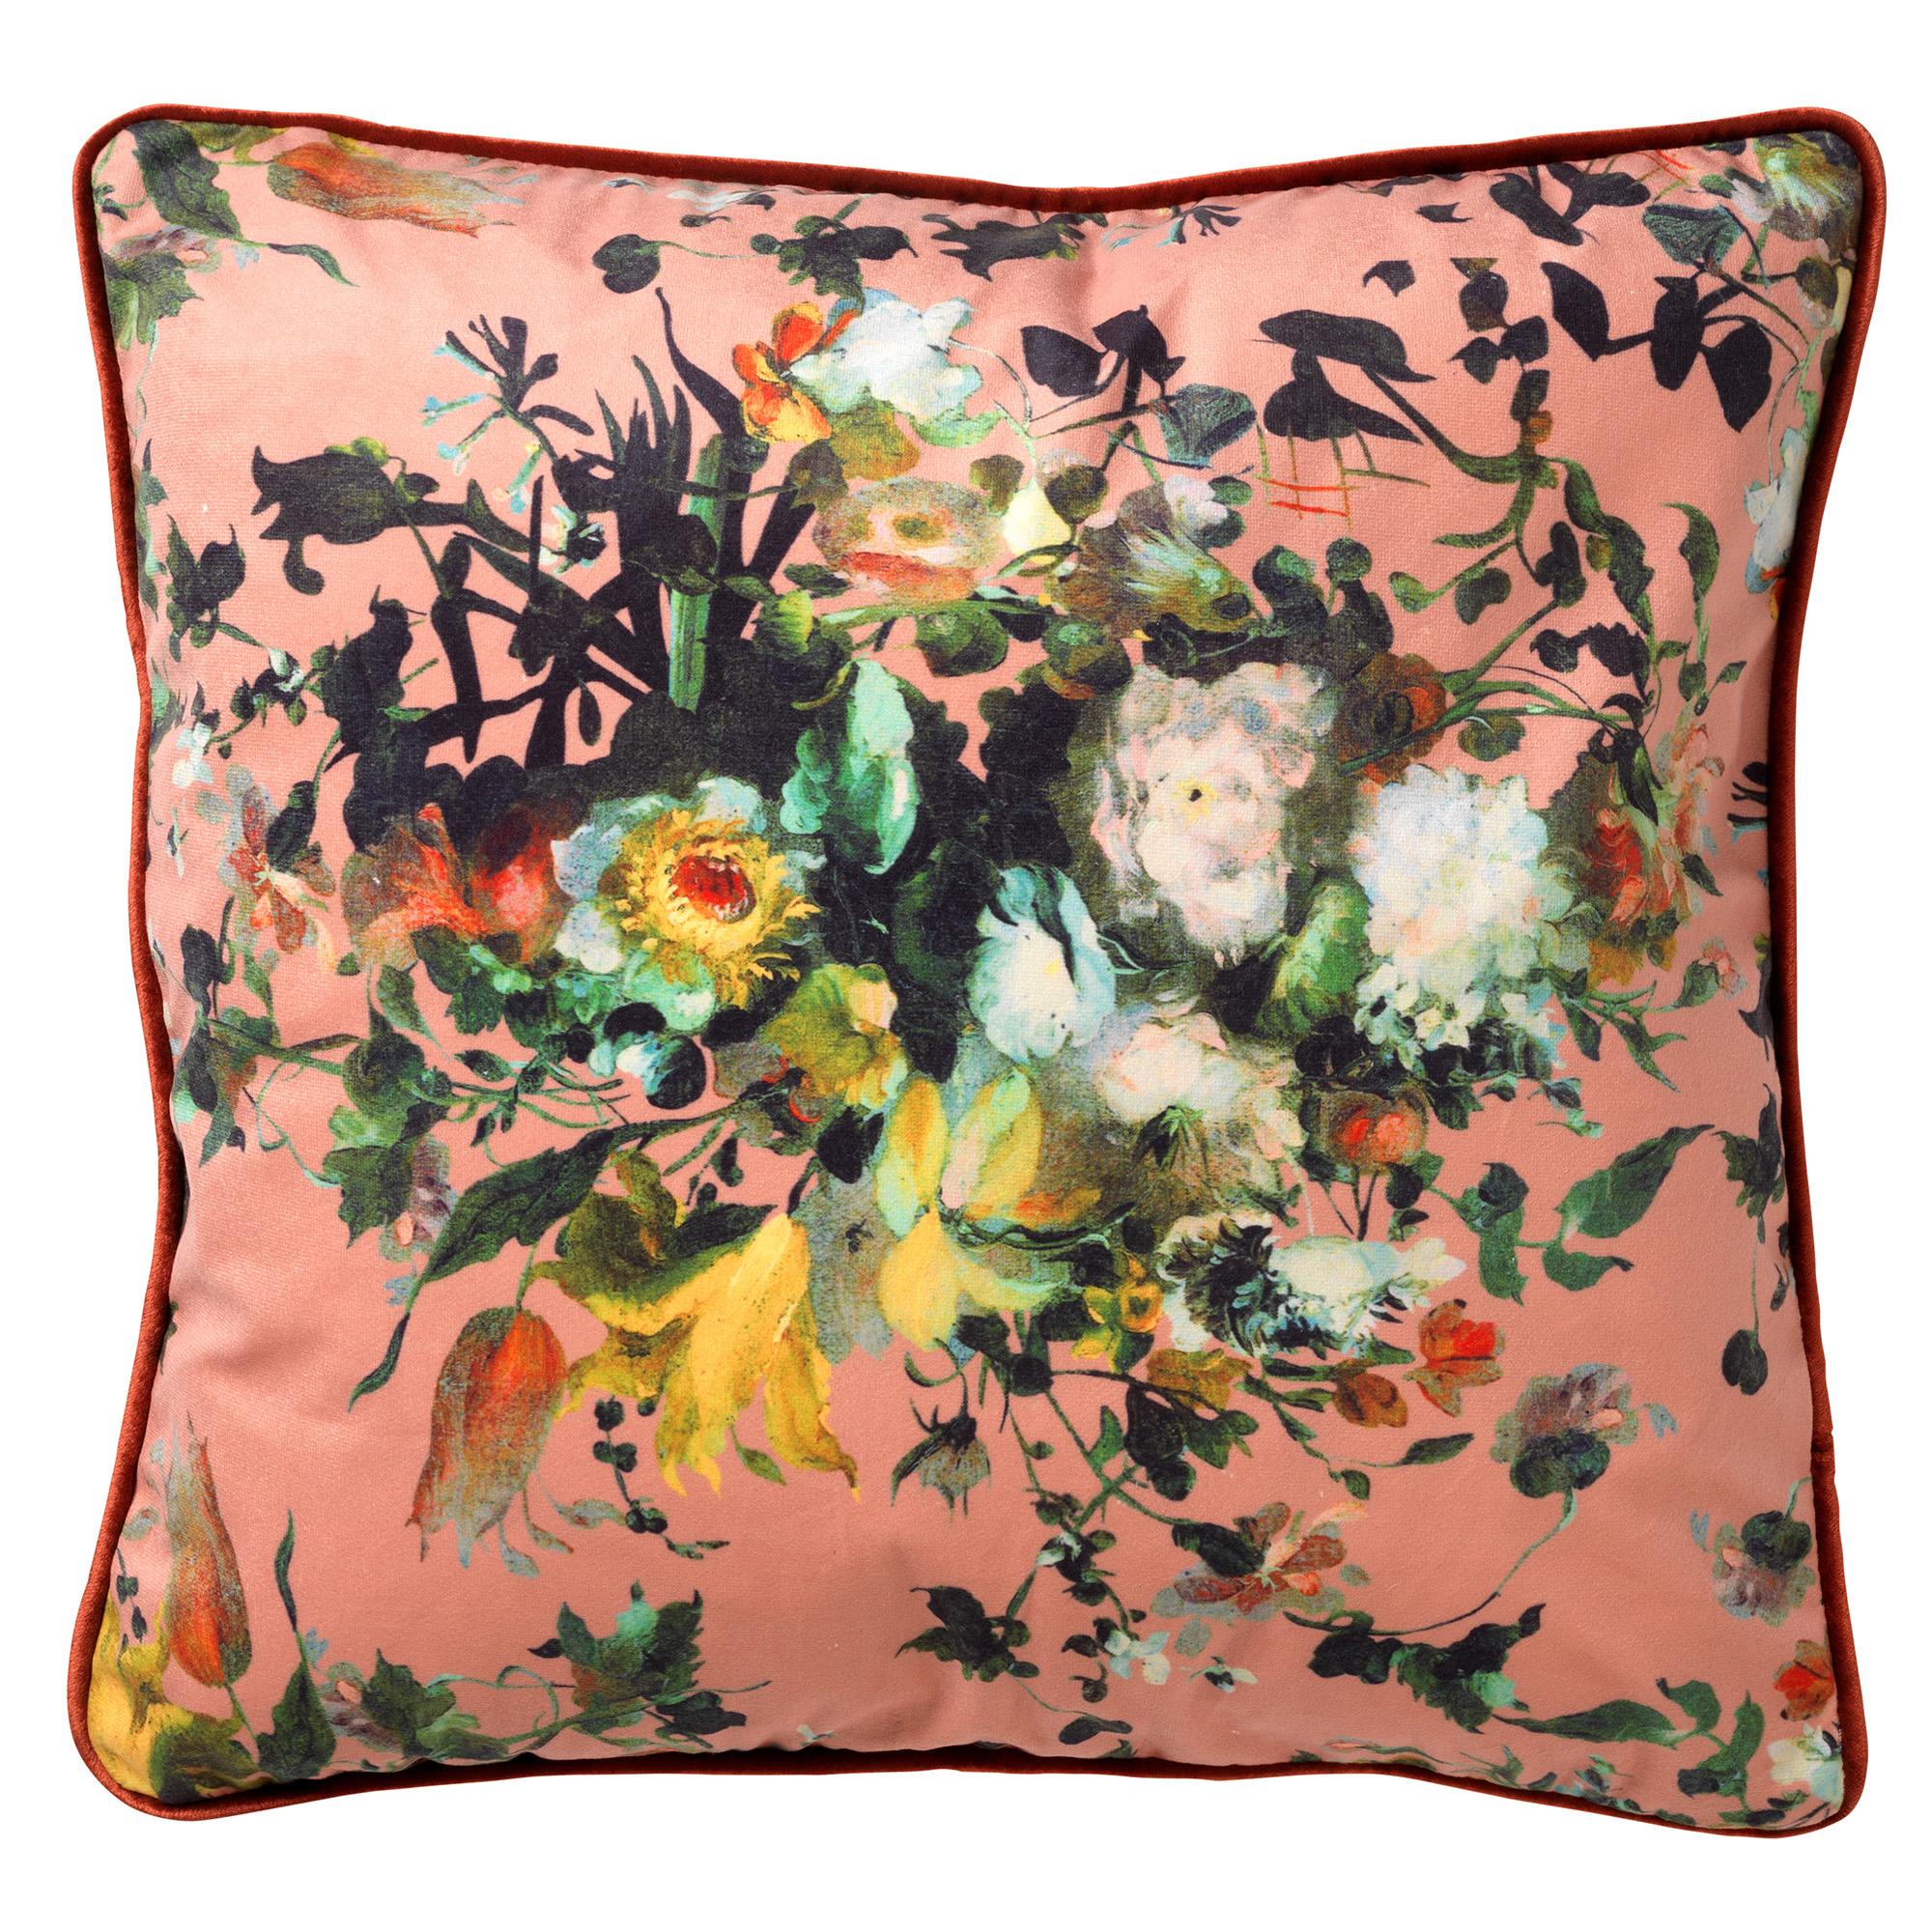 LIAN - Sierkussen met bloemenpatroon Muted Clay 45x45 cm